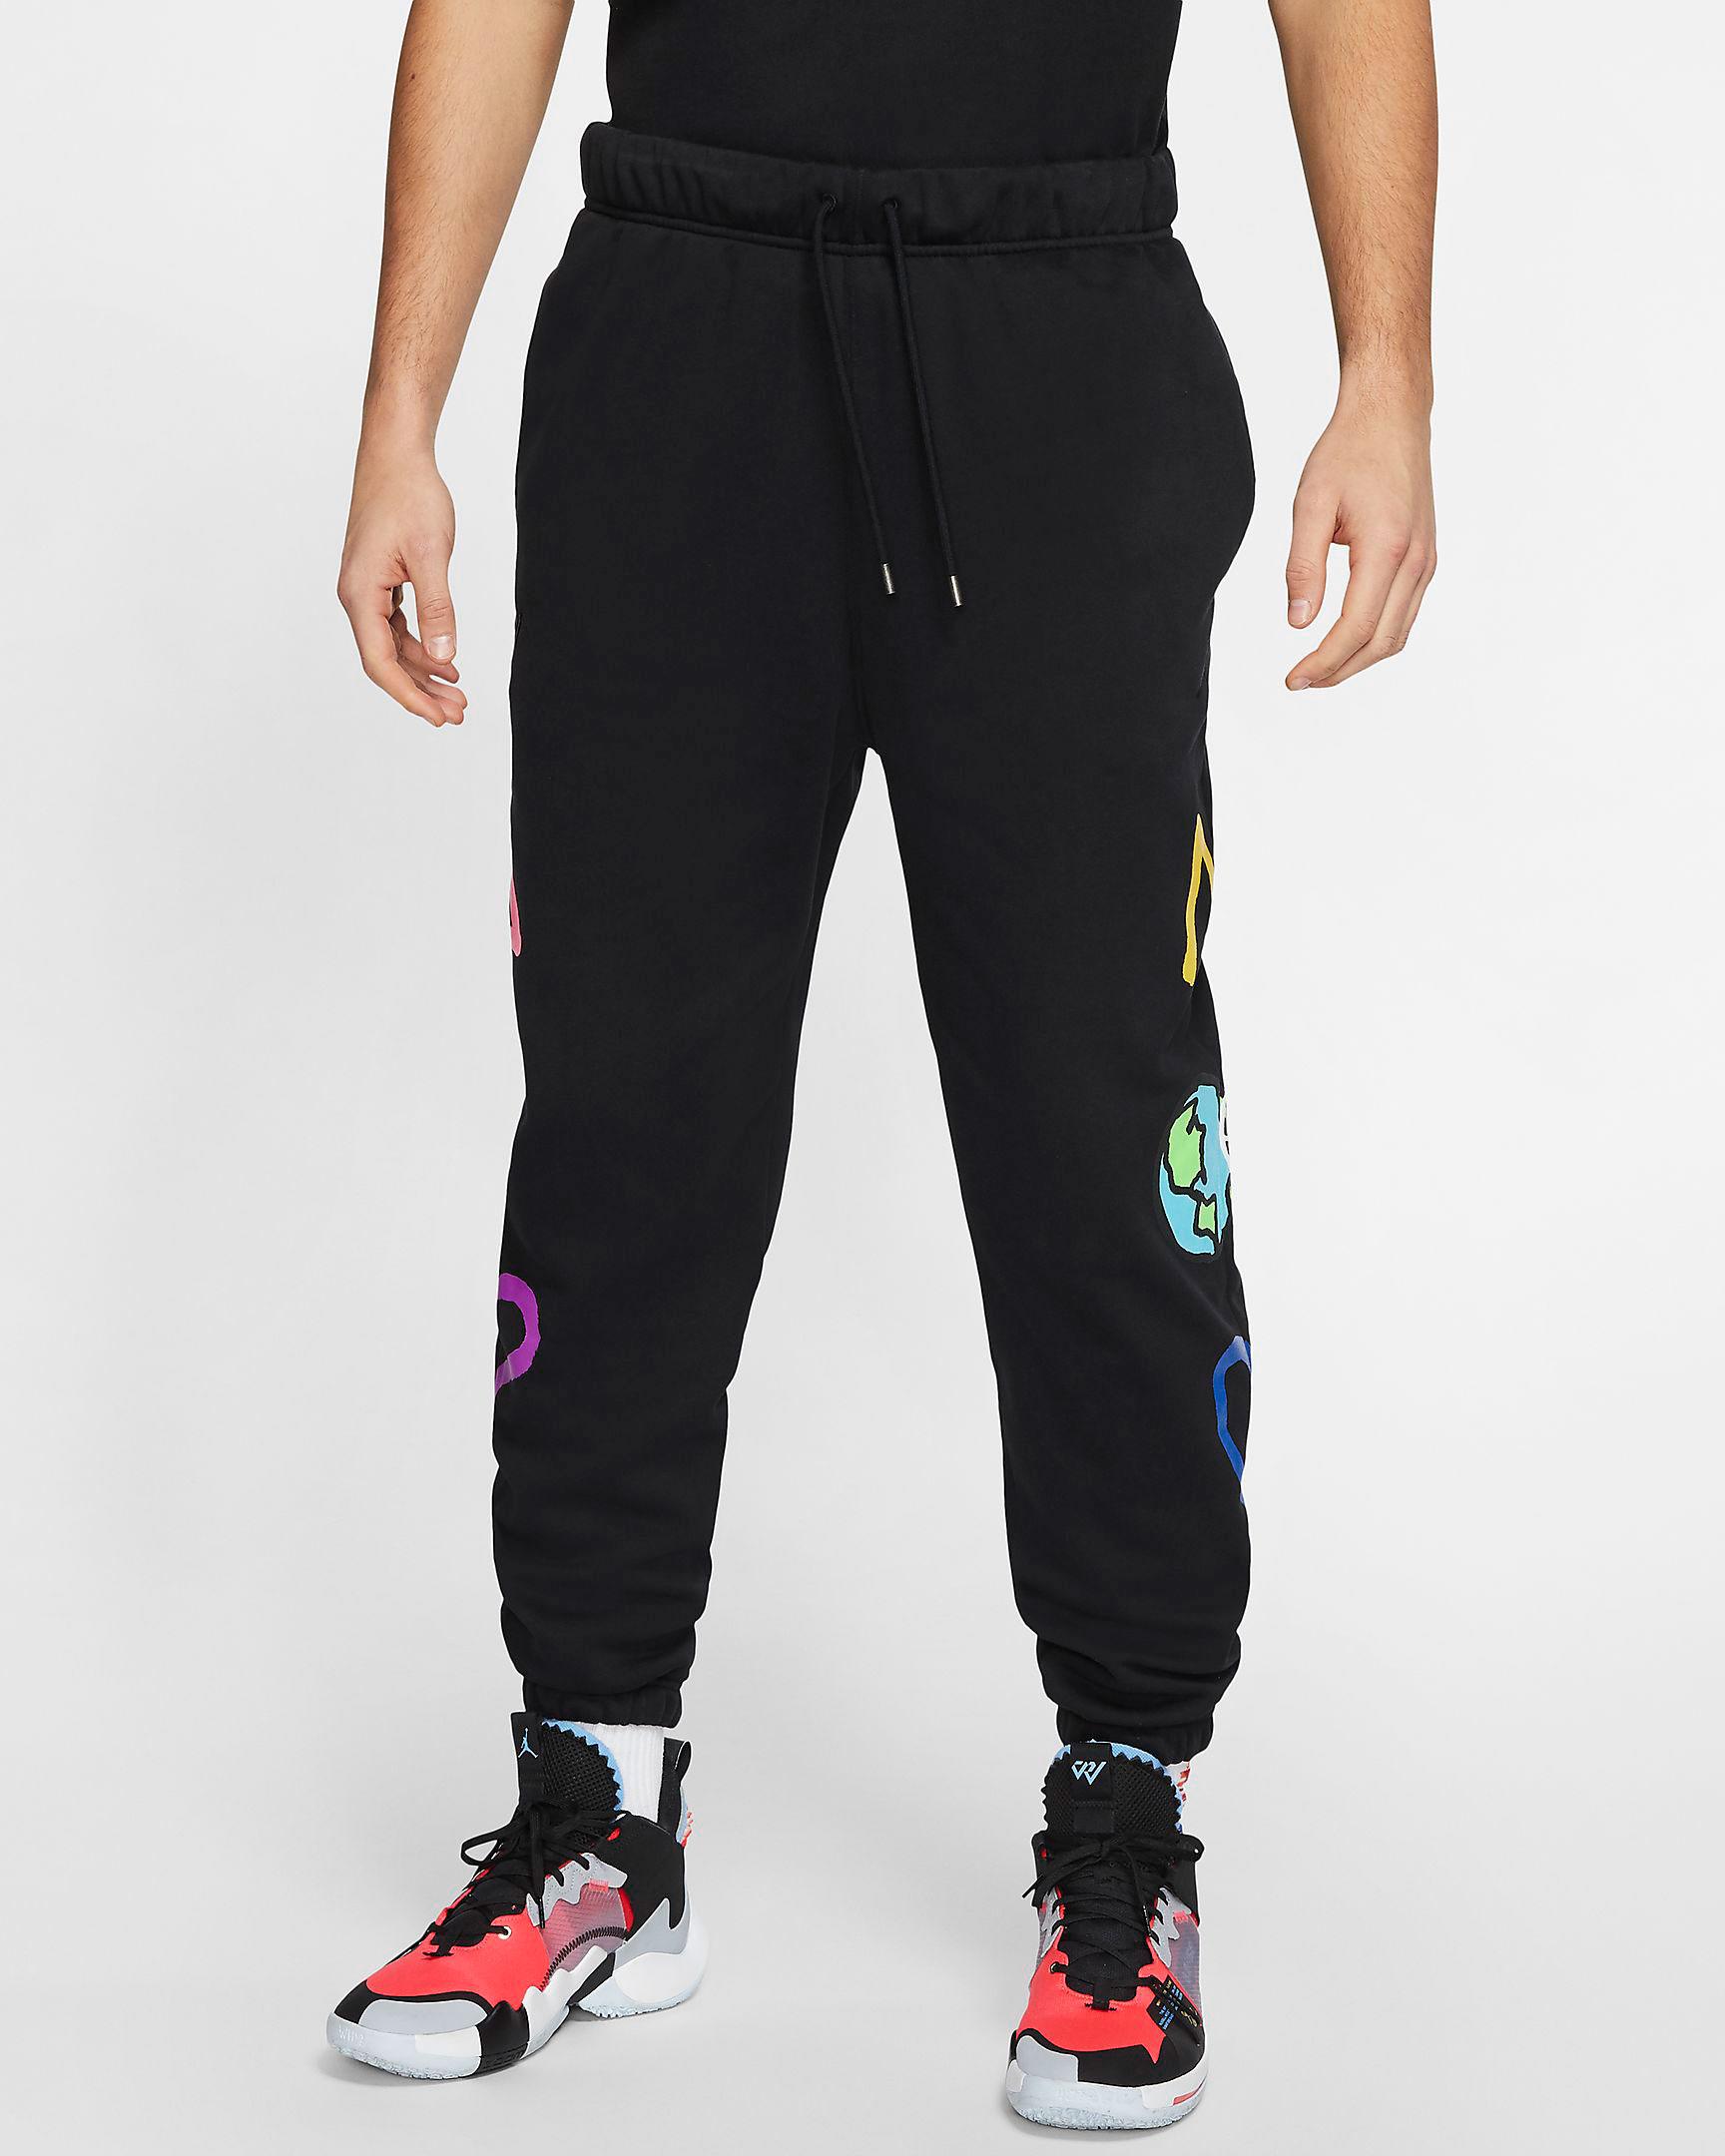 jordan-westbrook-why-not-zer03-pants-black-1